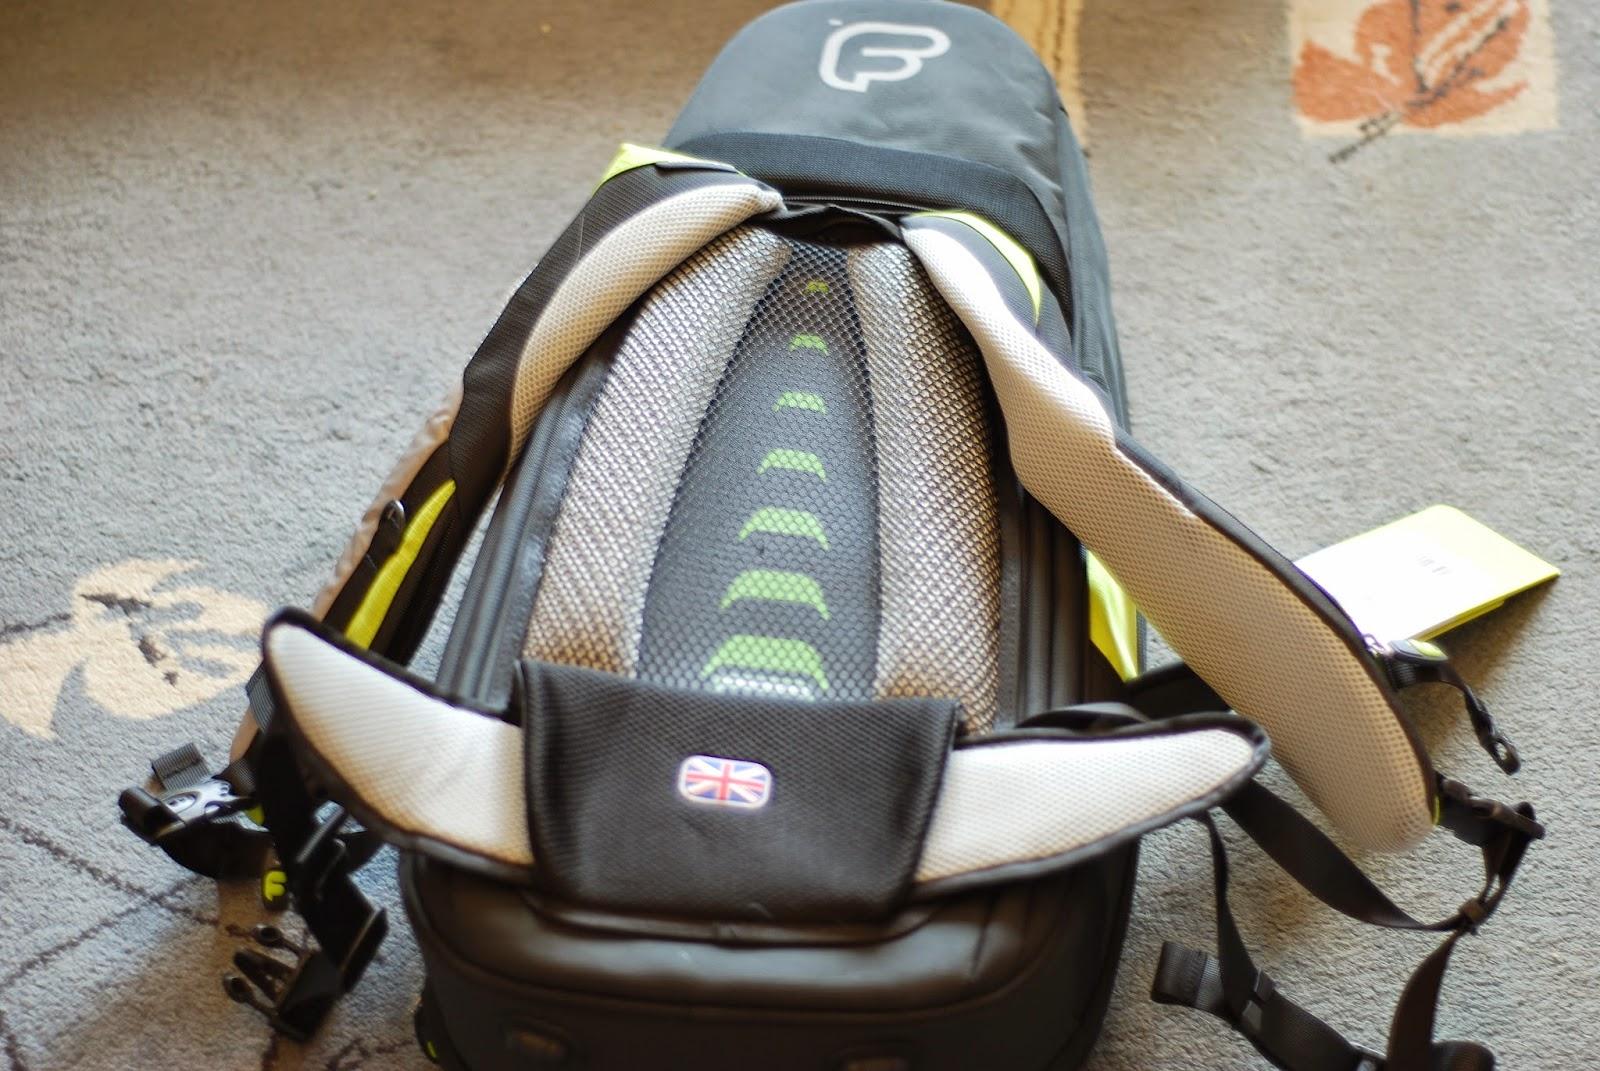 Fusion Premium Ukulele Gig Bag air flow system